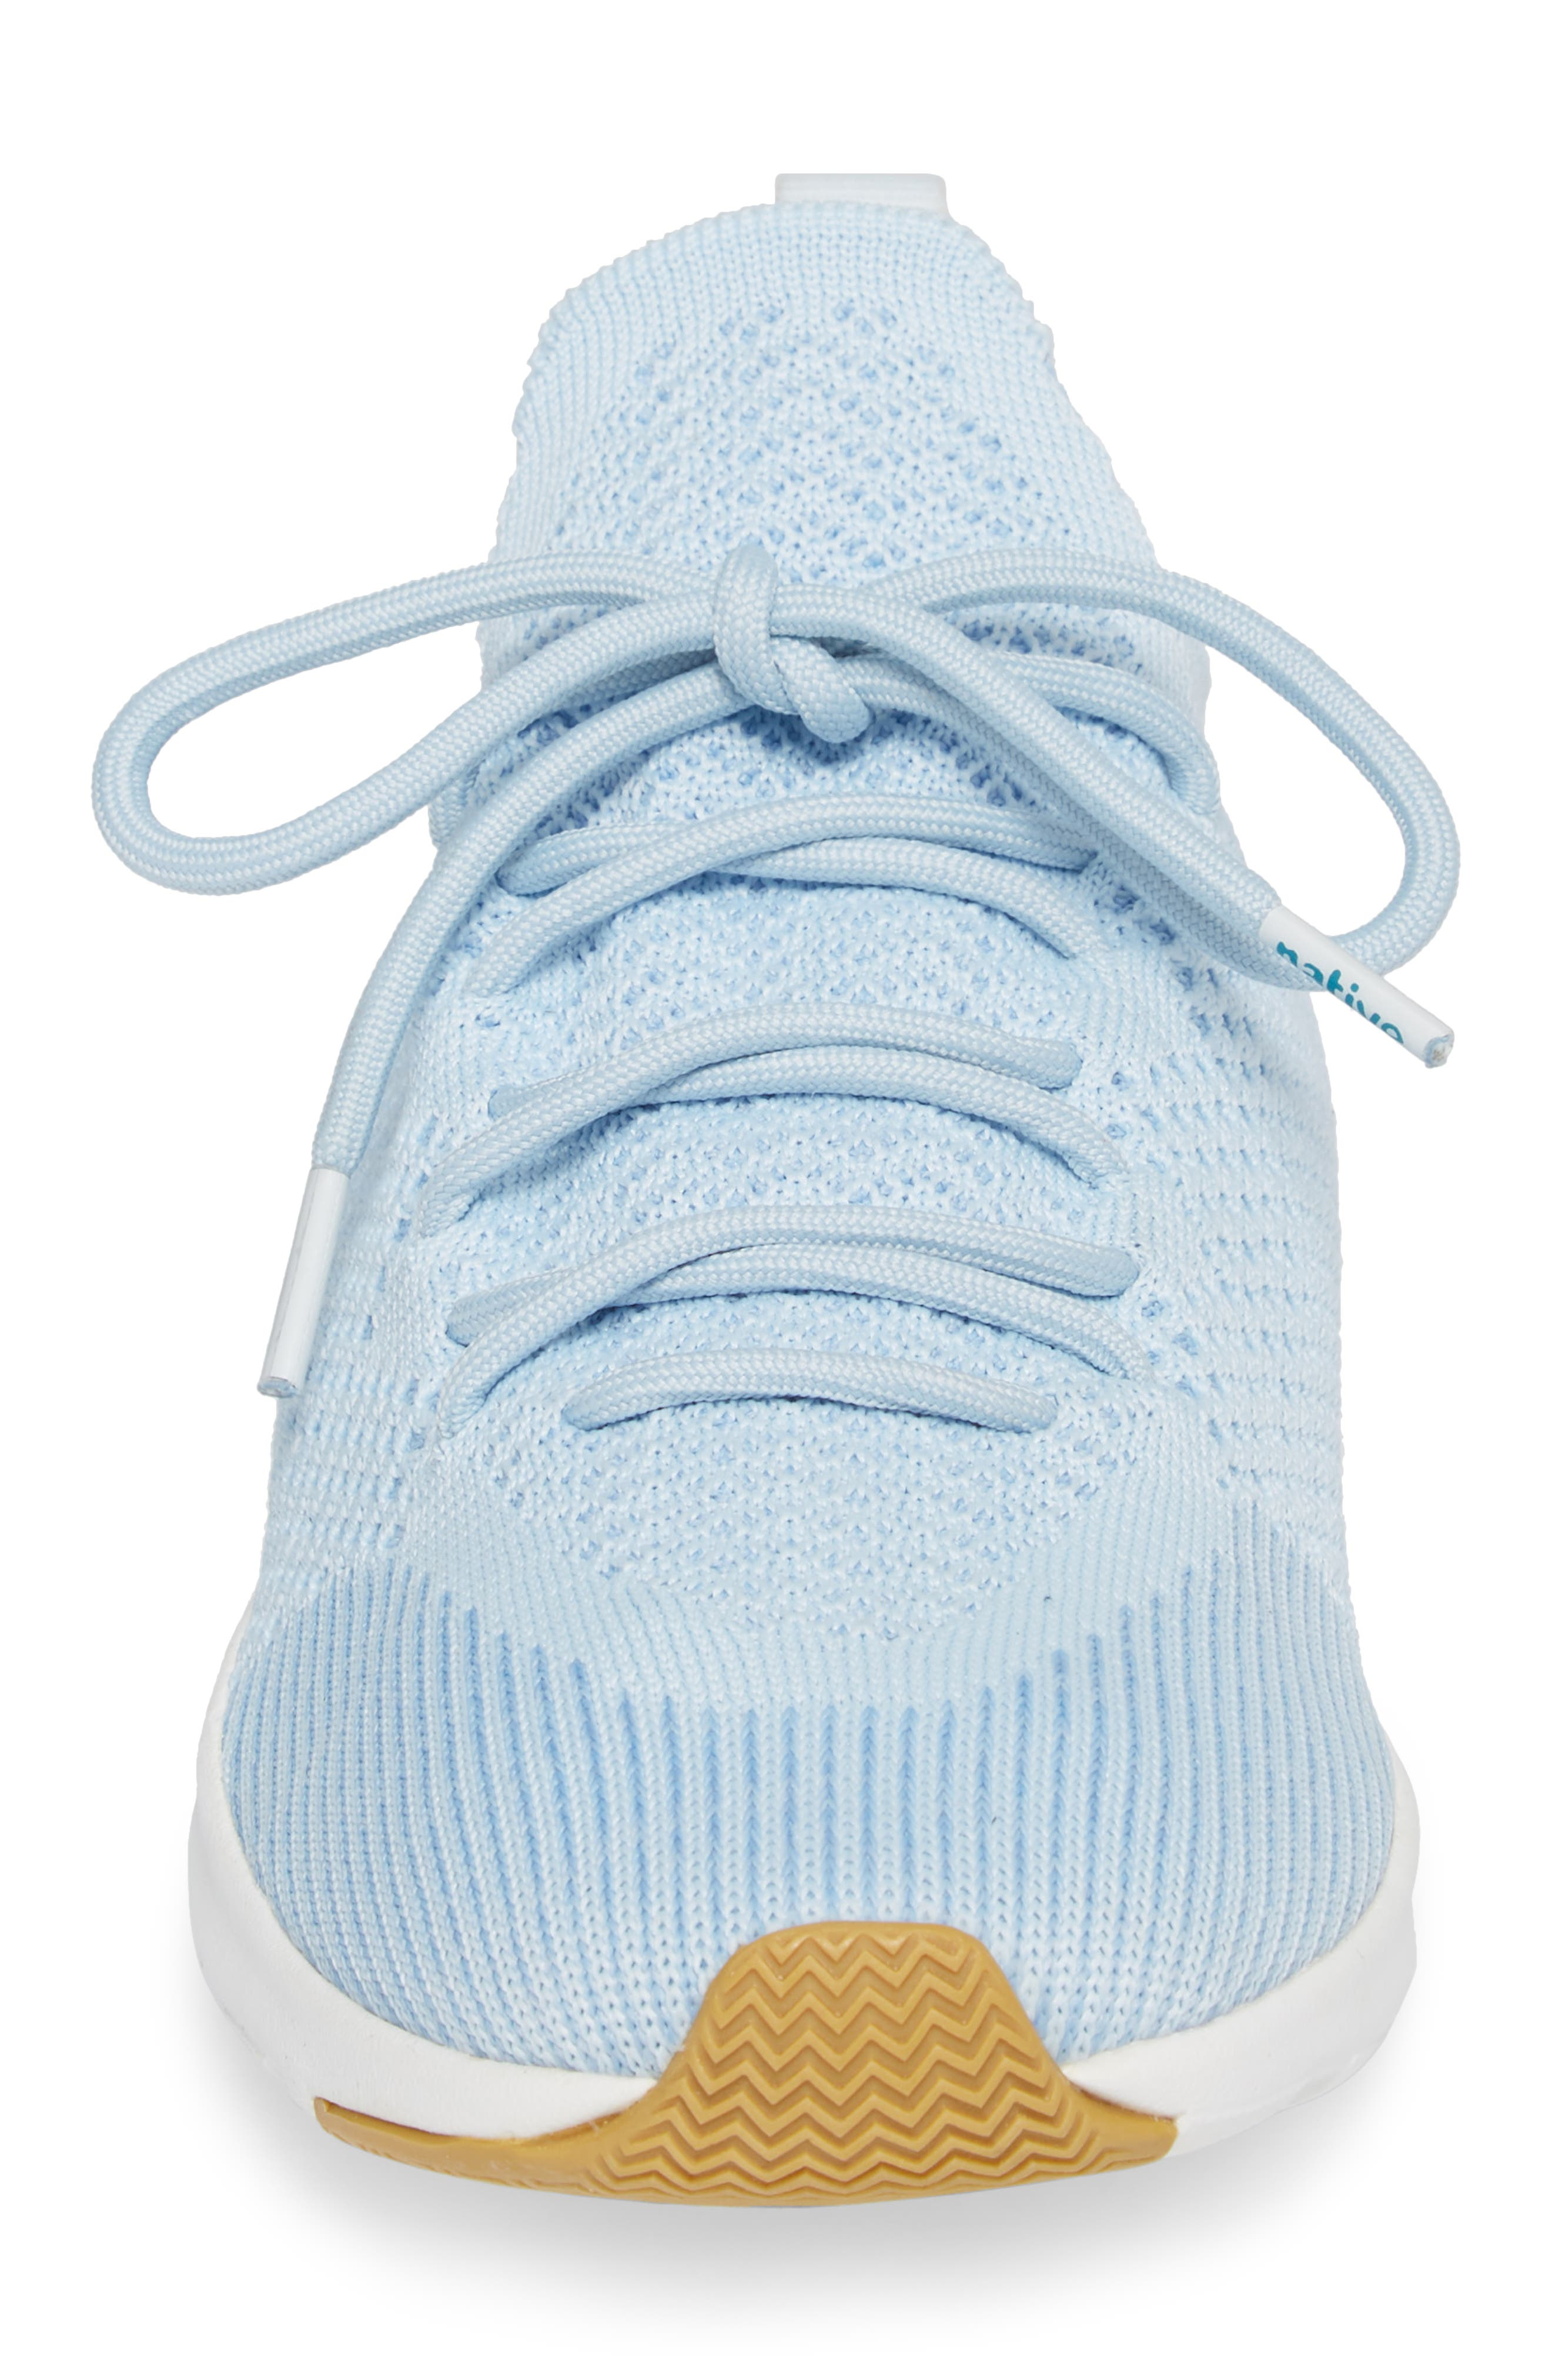 AP Mercury Liteknit<sup>™</sup> Sneaker,                             Alternate thumbnail 4, color,                             AIR BLUE/ SHELL WHITE